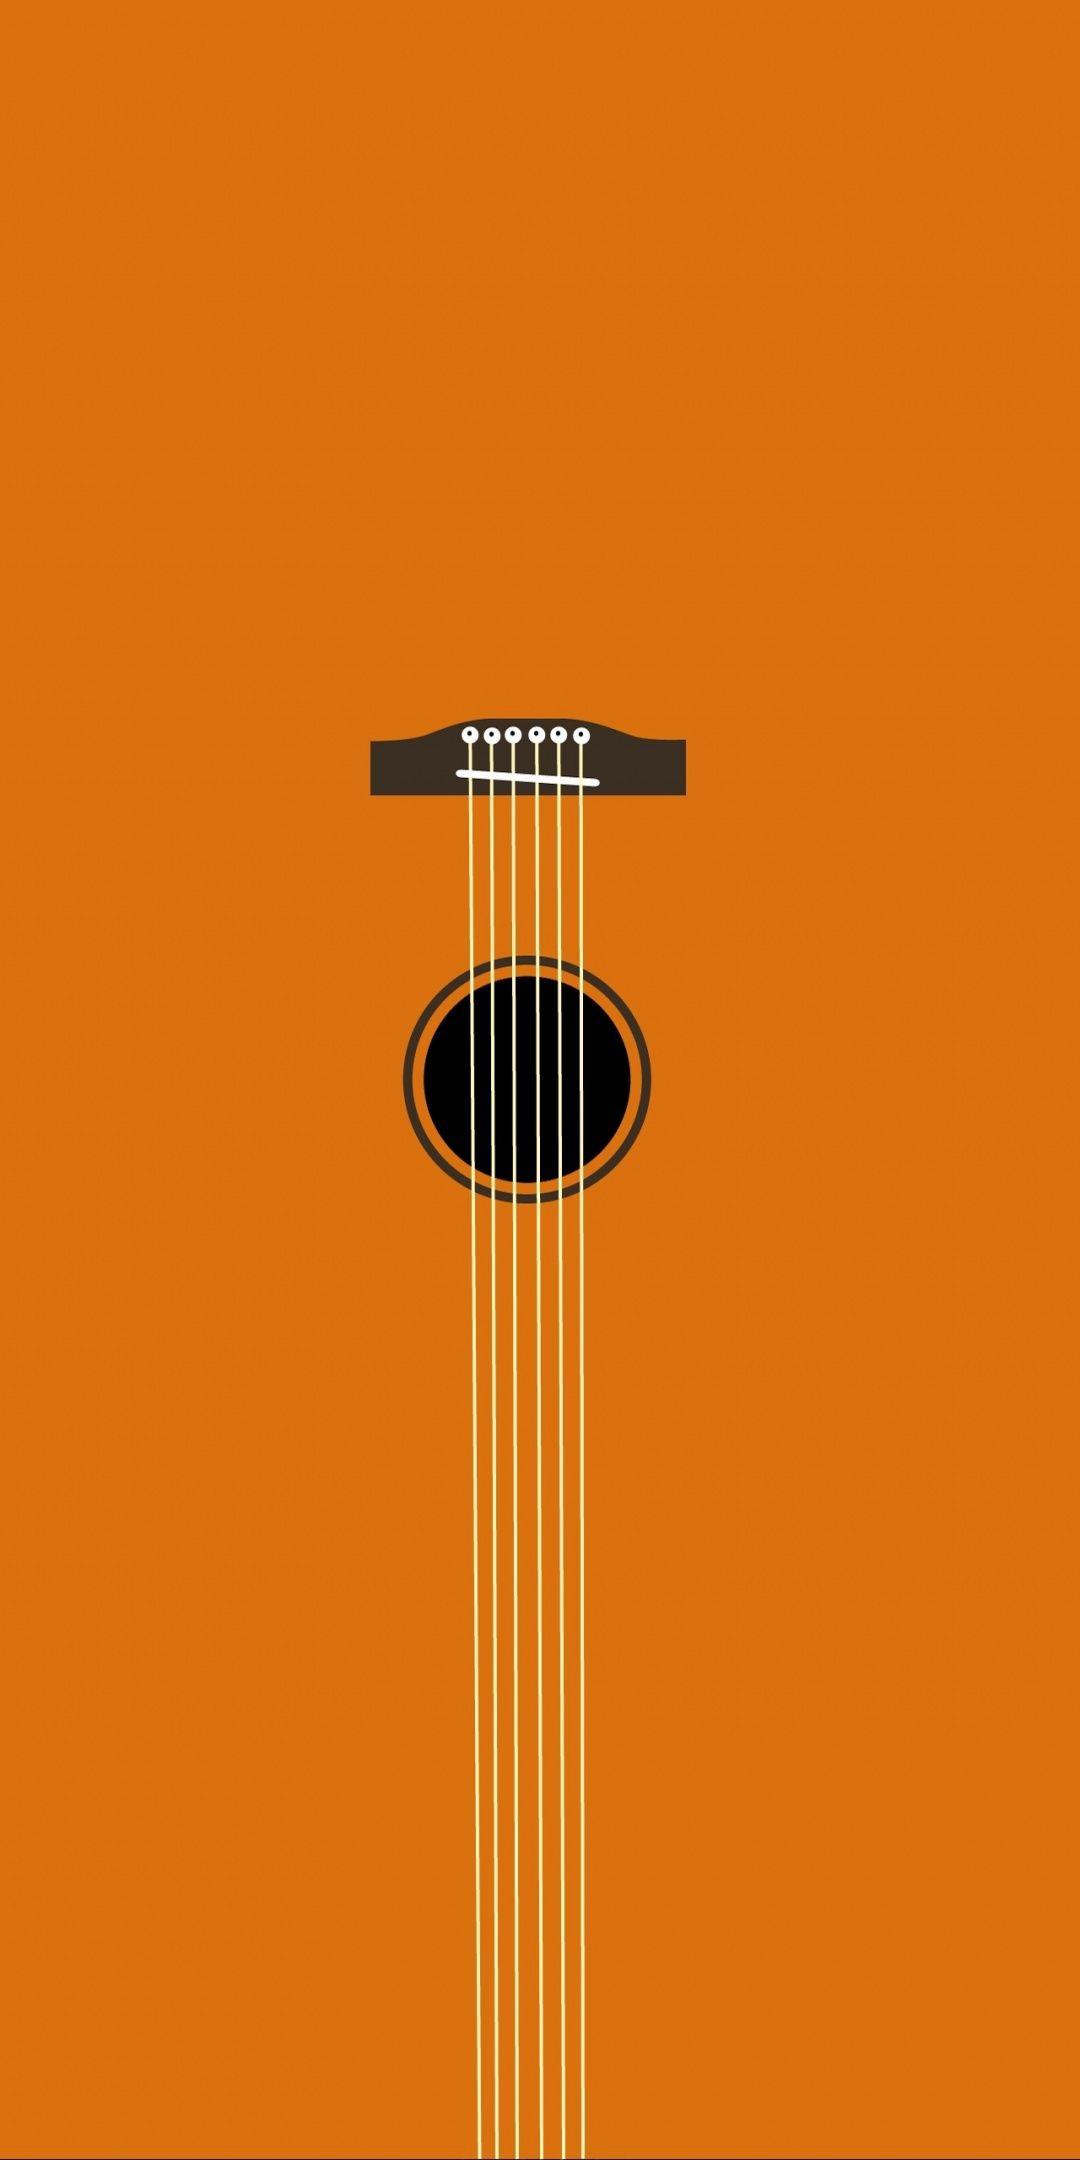 Minimal Music Guitar Art 1080x2160 Wallpaper Music Wallpaper Acoustic Guitar Photography Dark Wallpaper Iphone